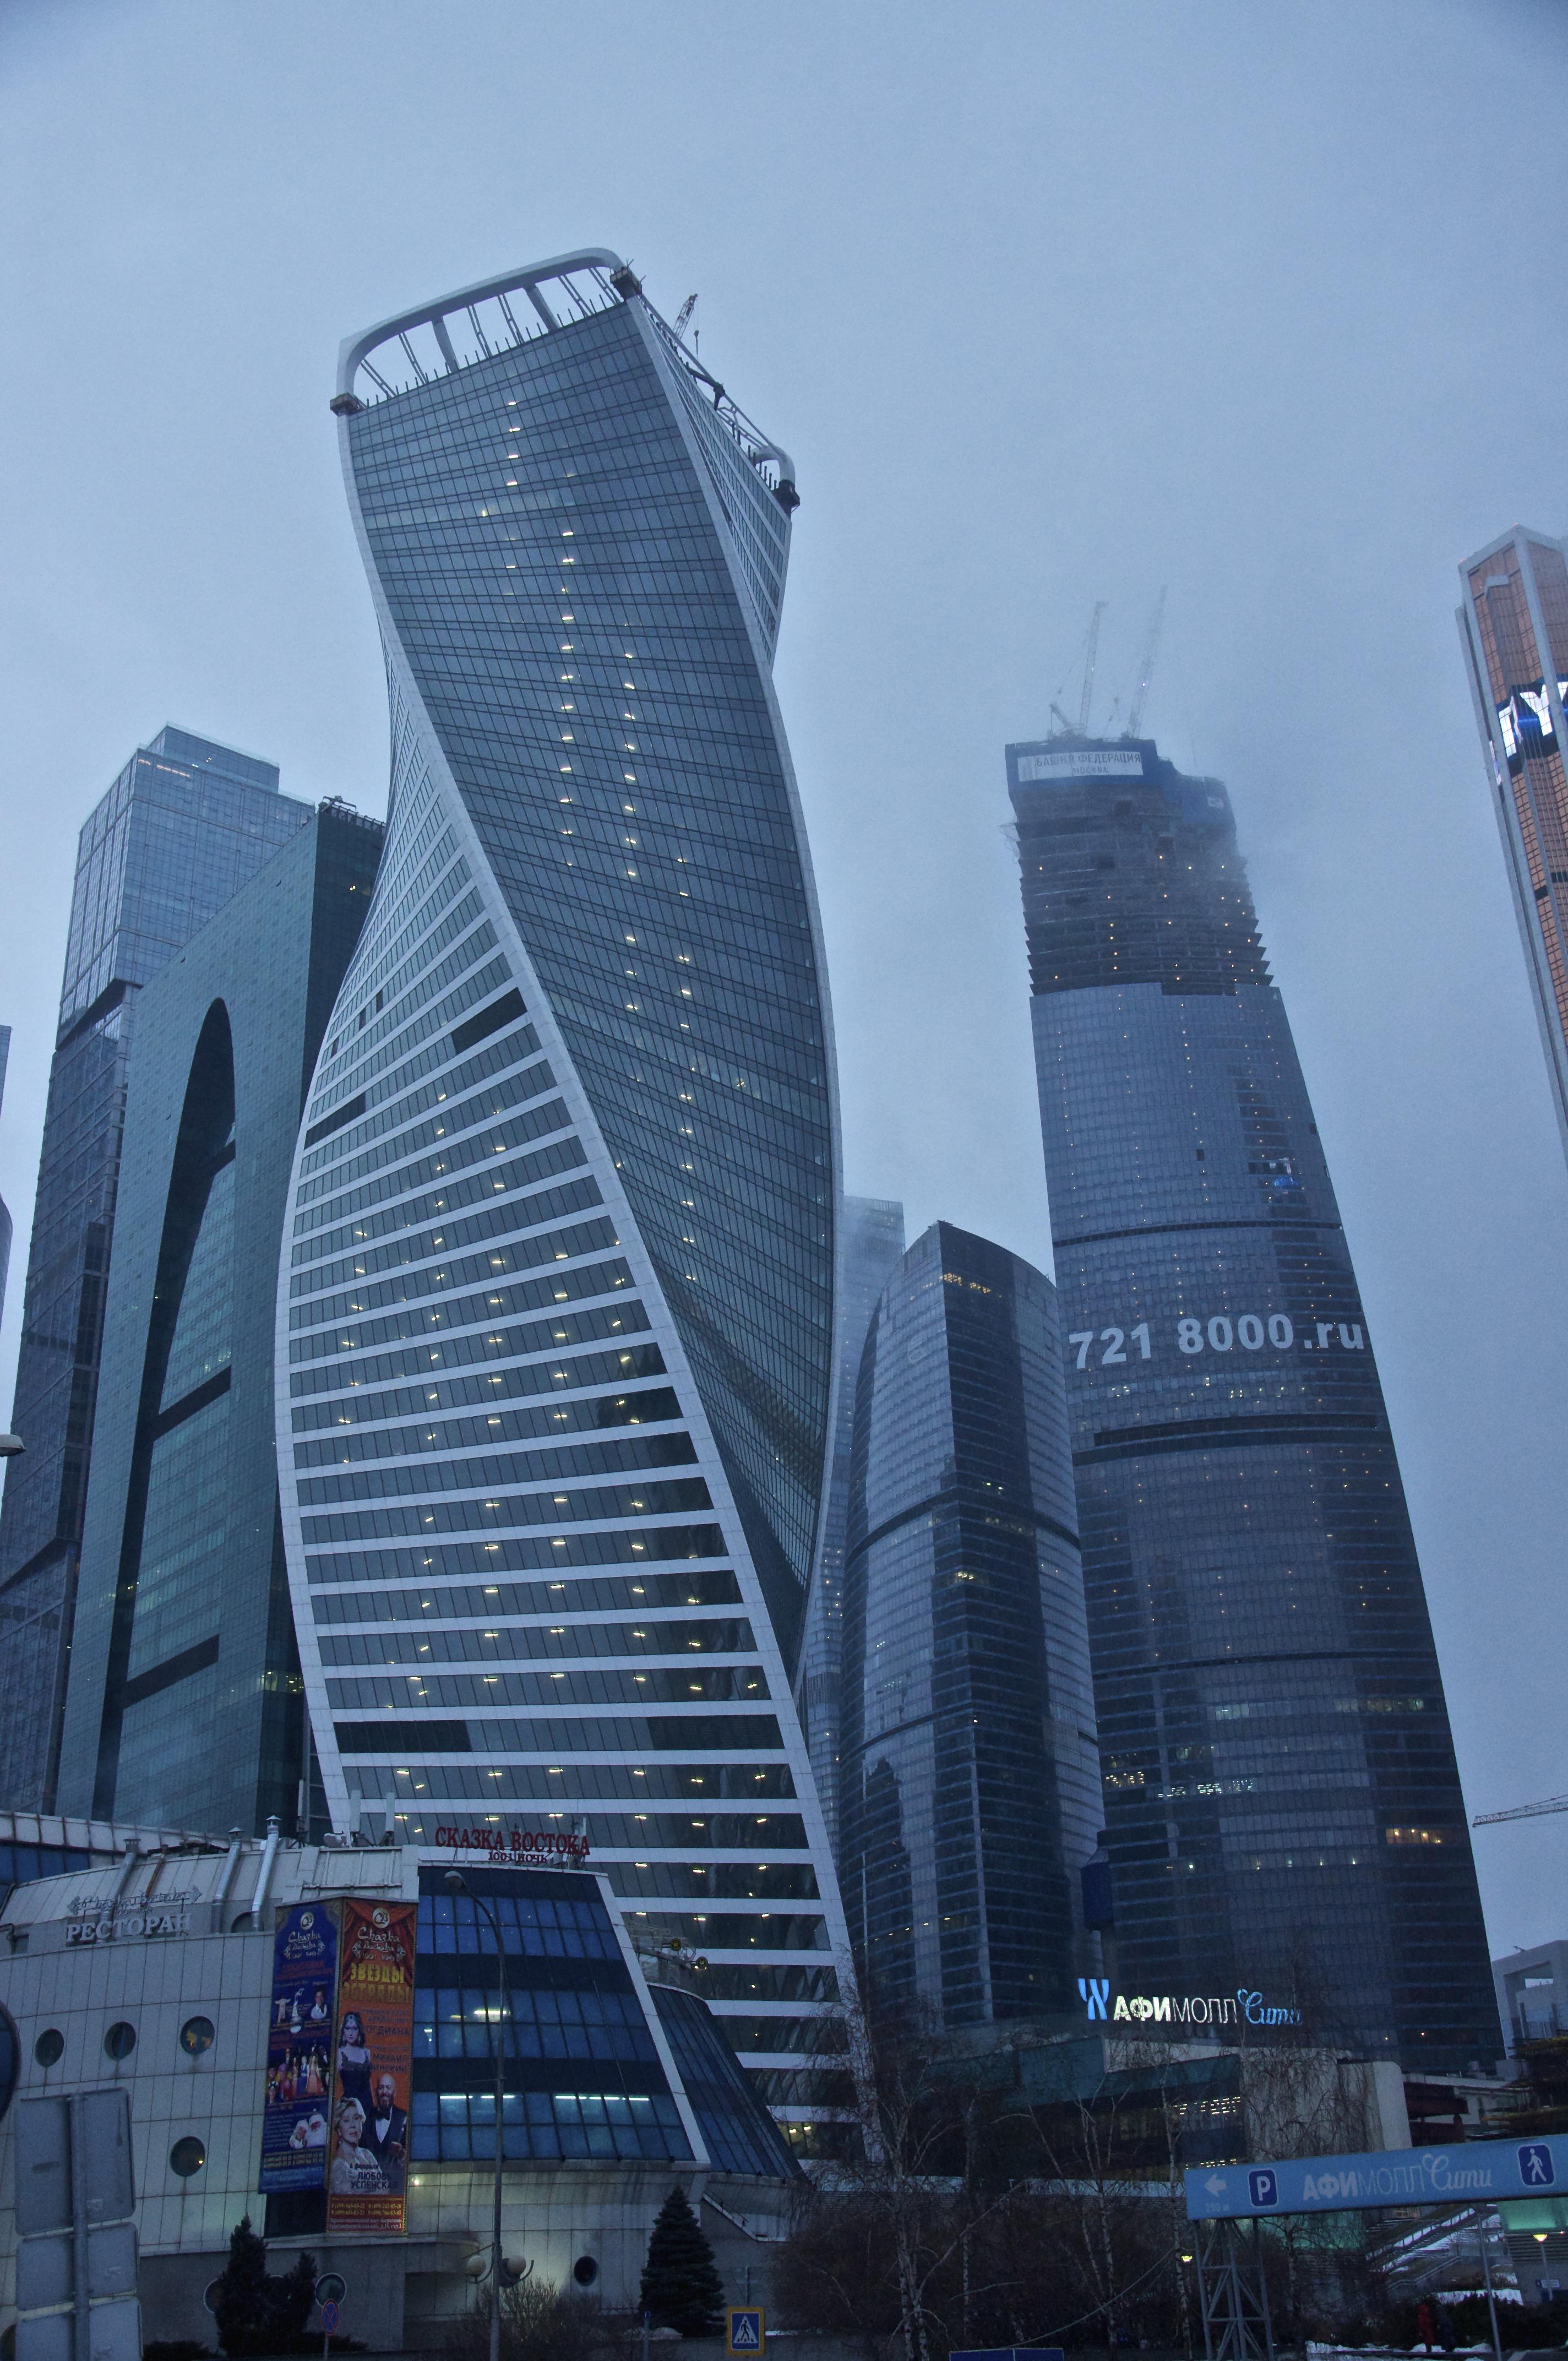 Evolution Tower, Moscow International Business Center. [2848 × 4288]